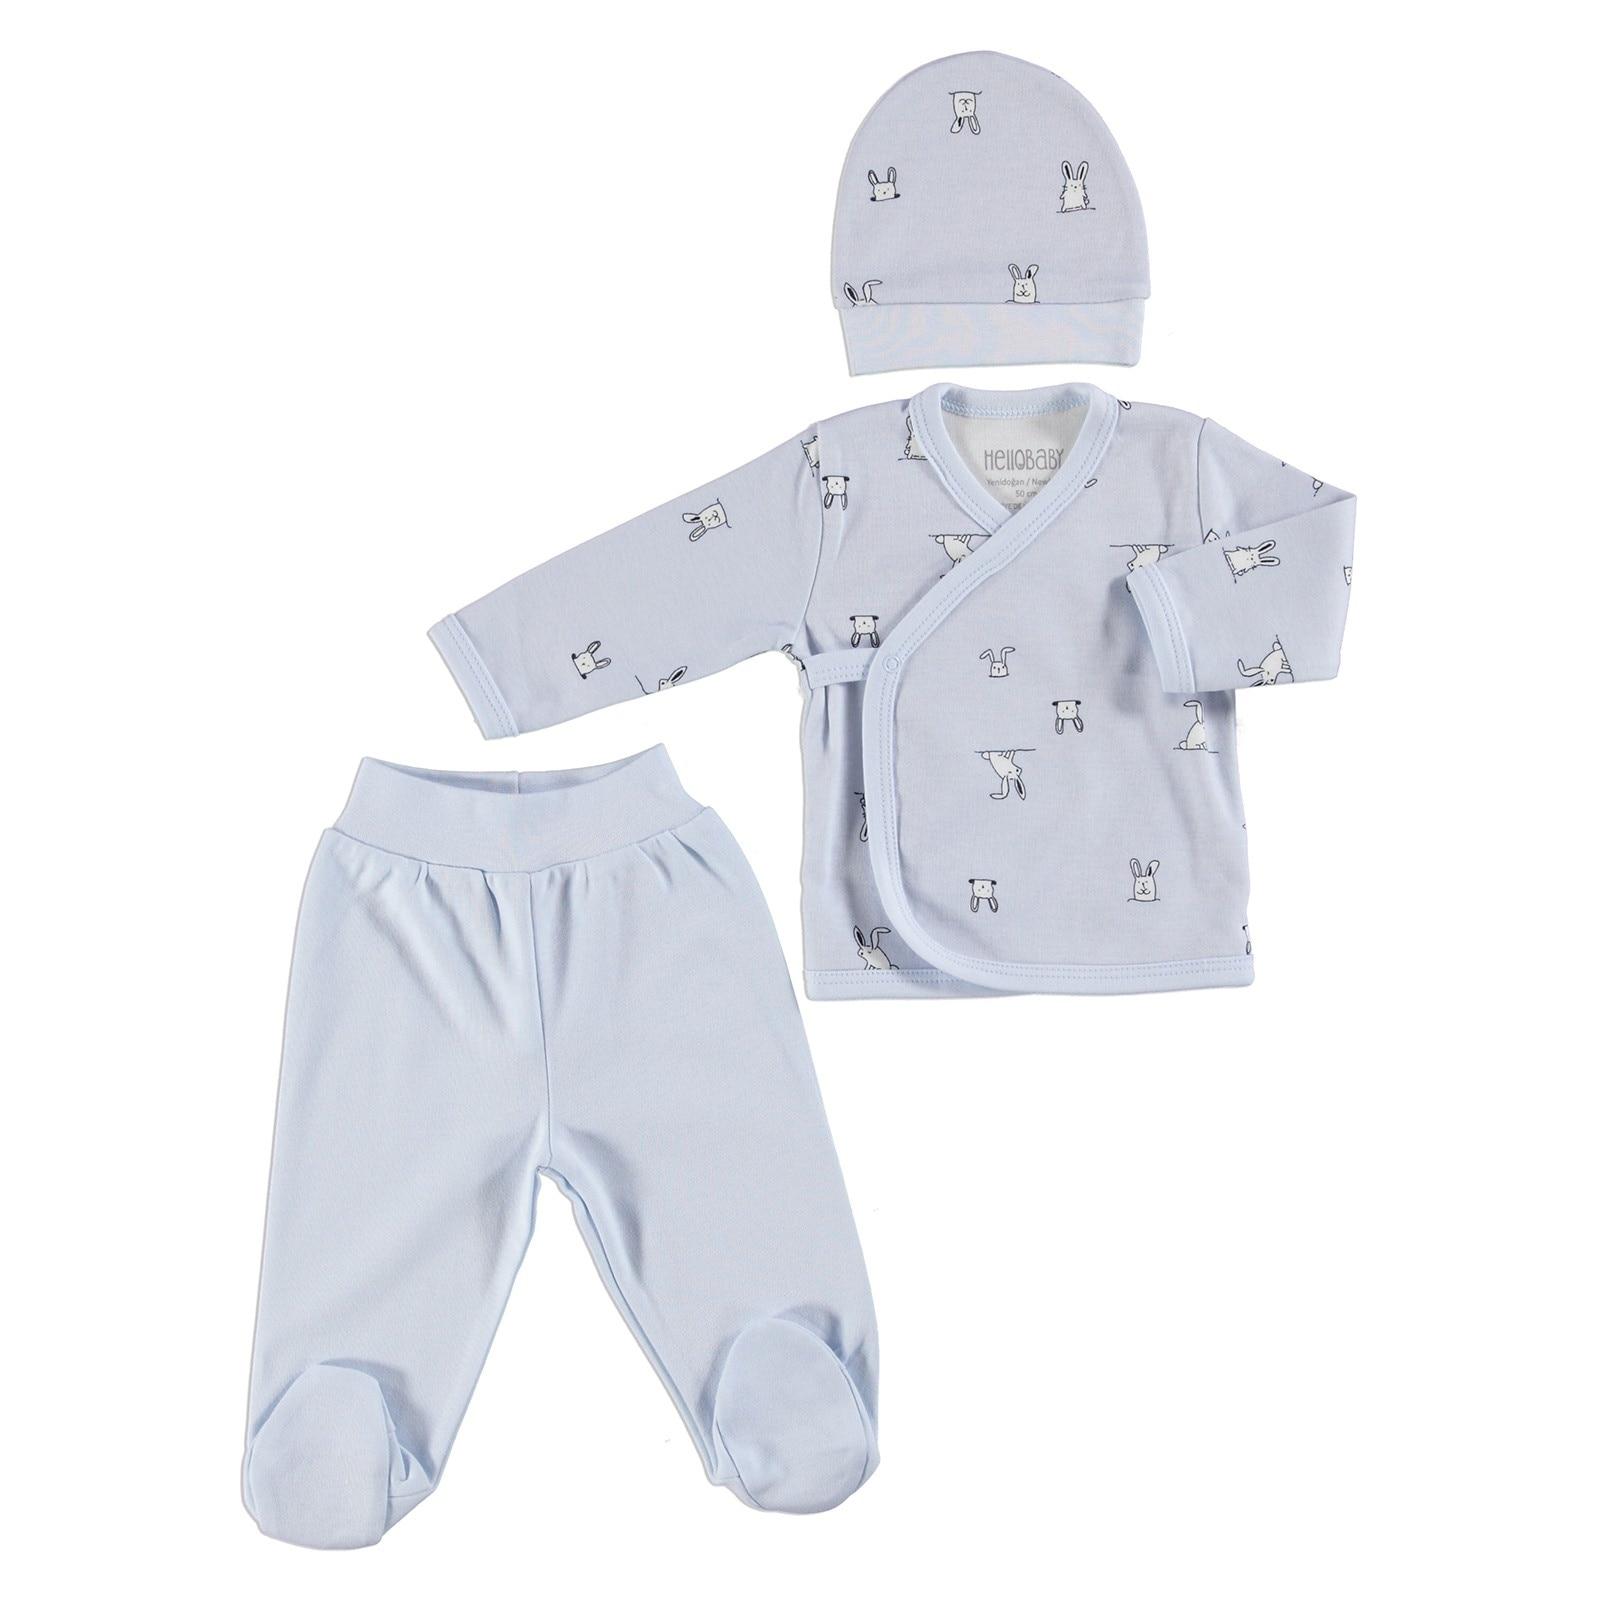 ebebek HelloBaby Baby Tracksuit Bottom Pants For Newborns Baby Leggings Newborn Hospital